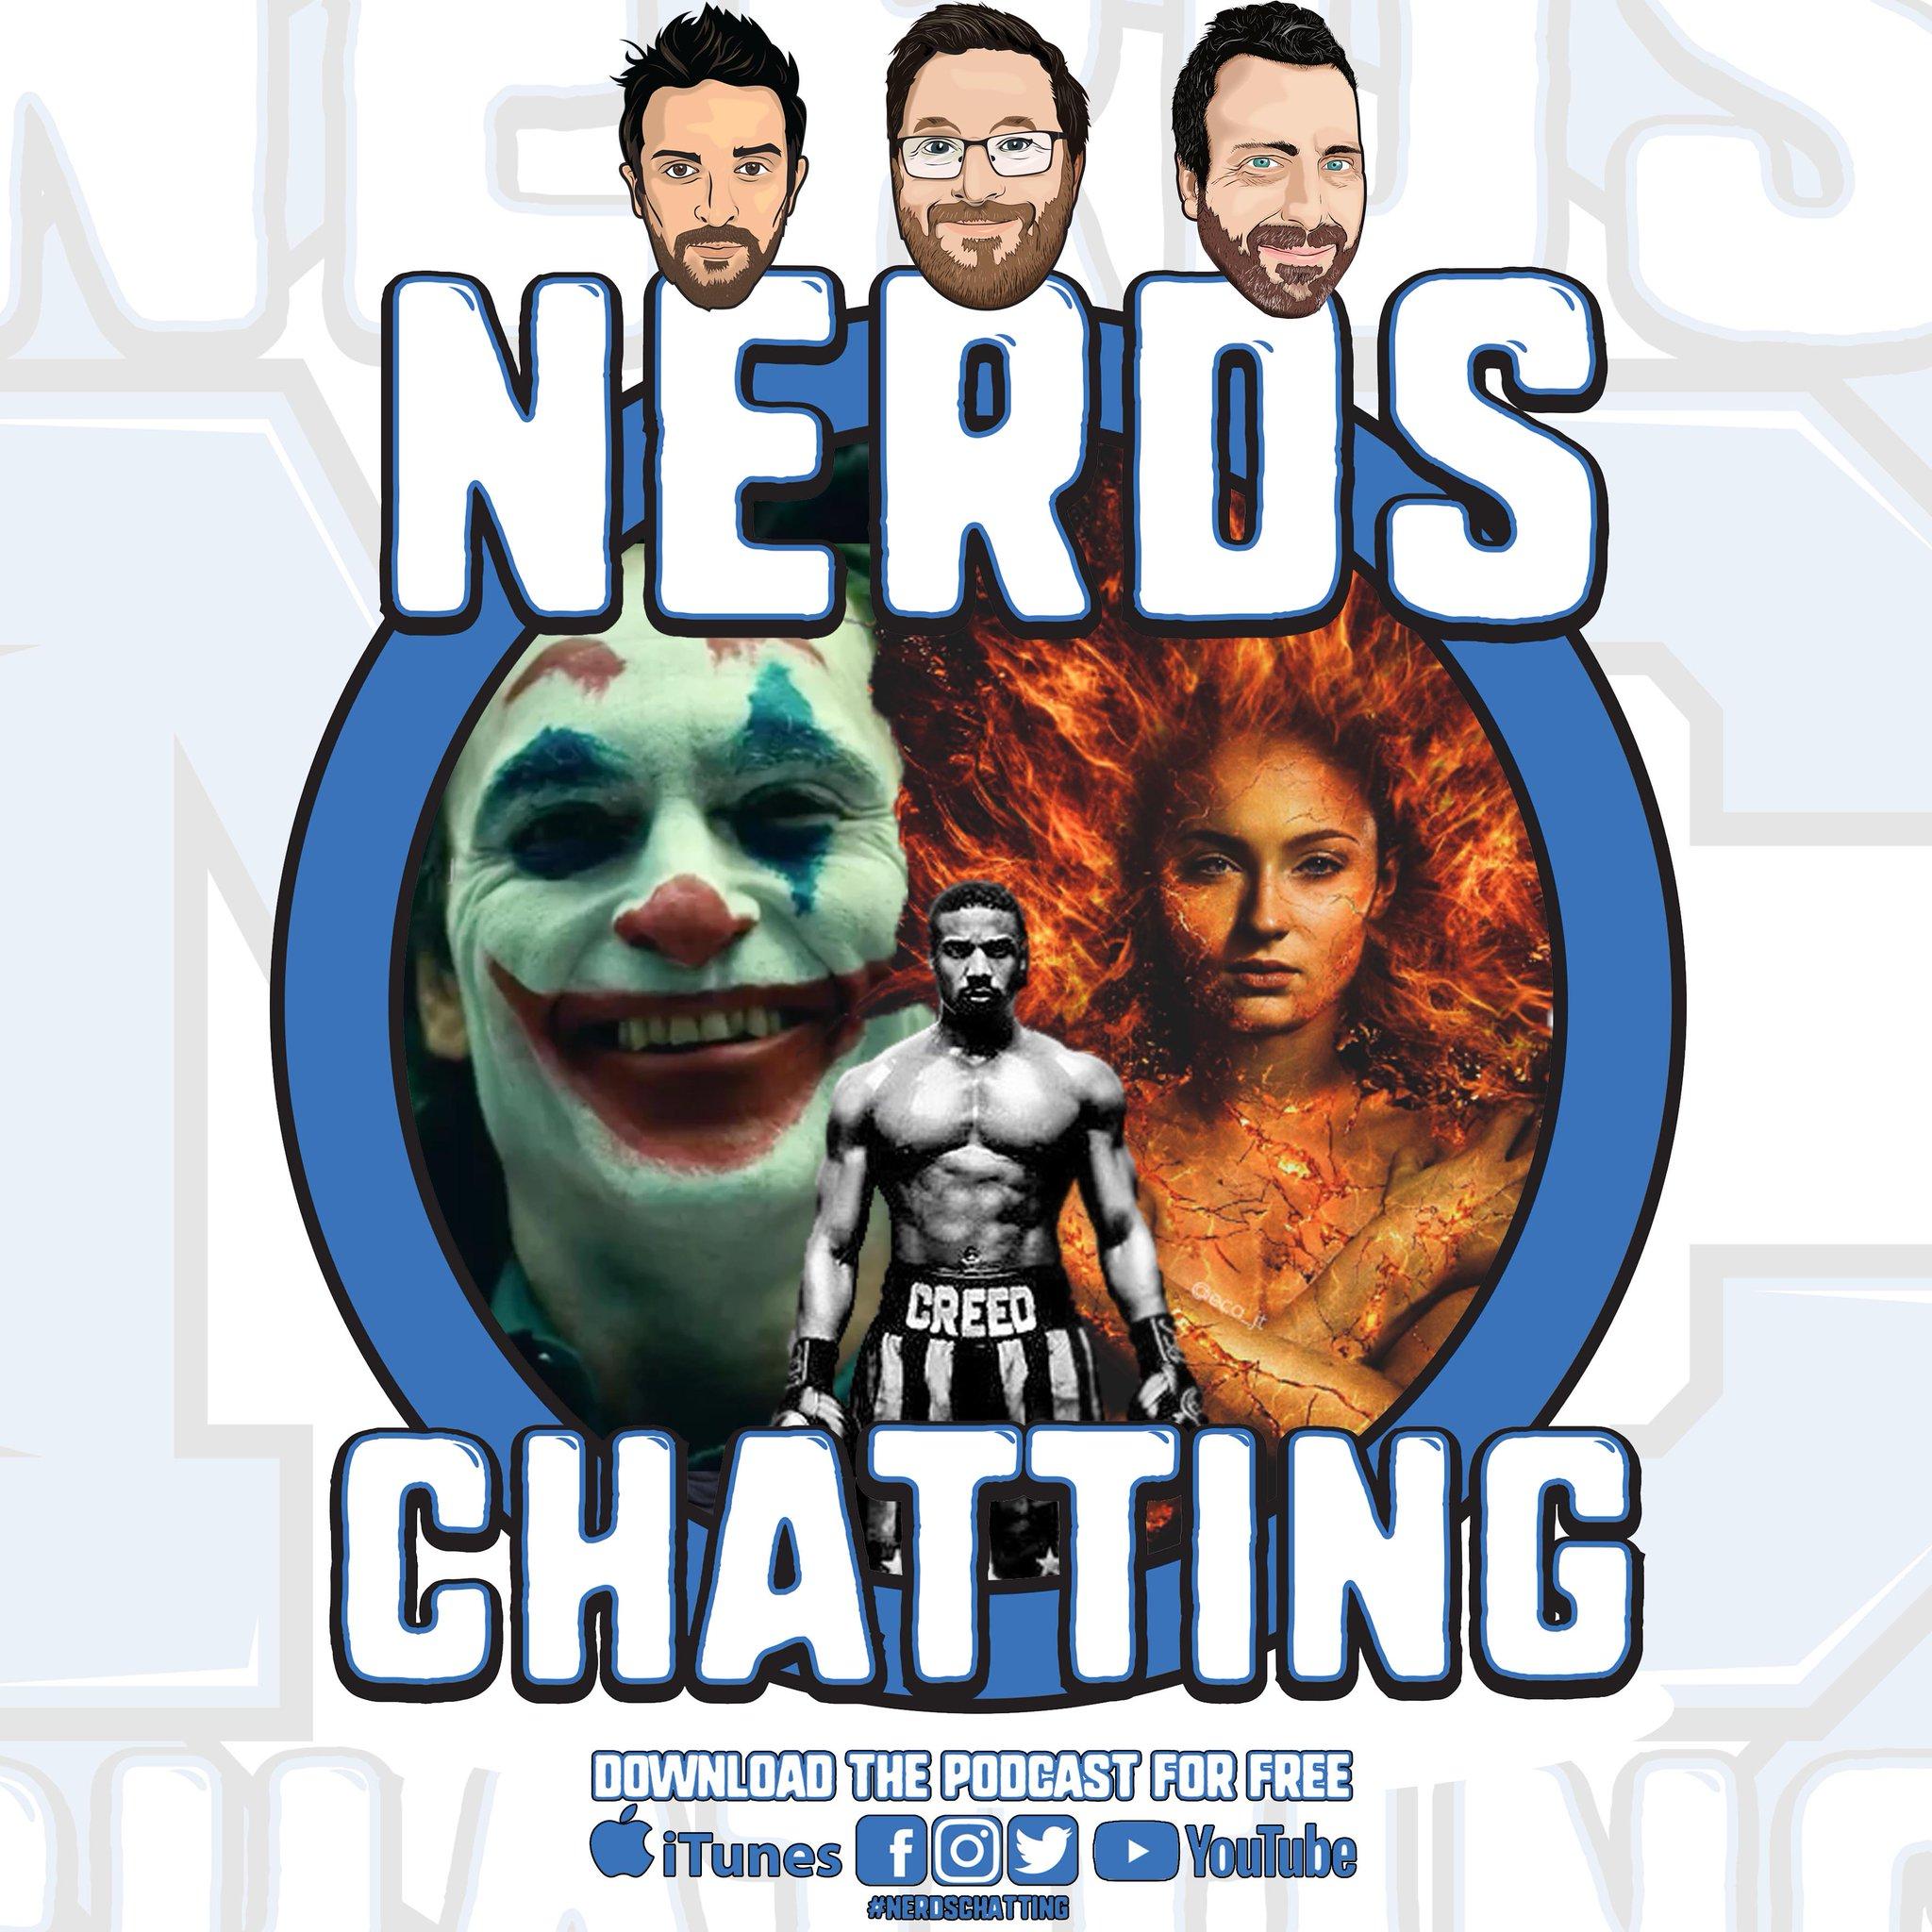 nerdschatting (Movies TV Comics) on Twitter: